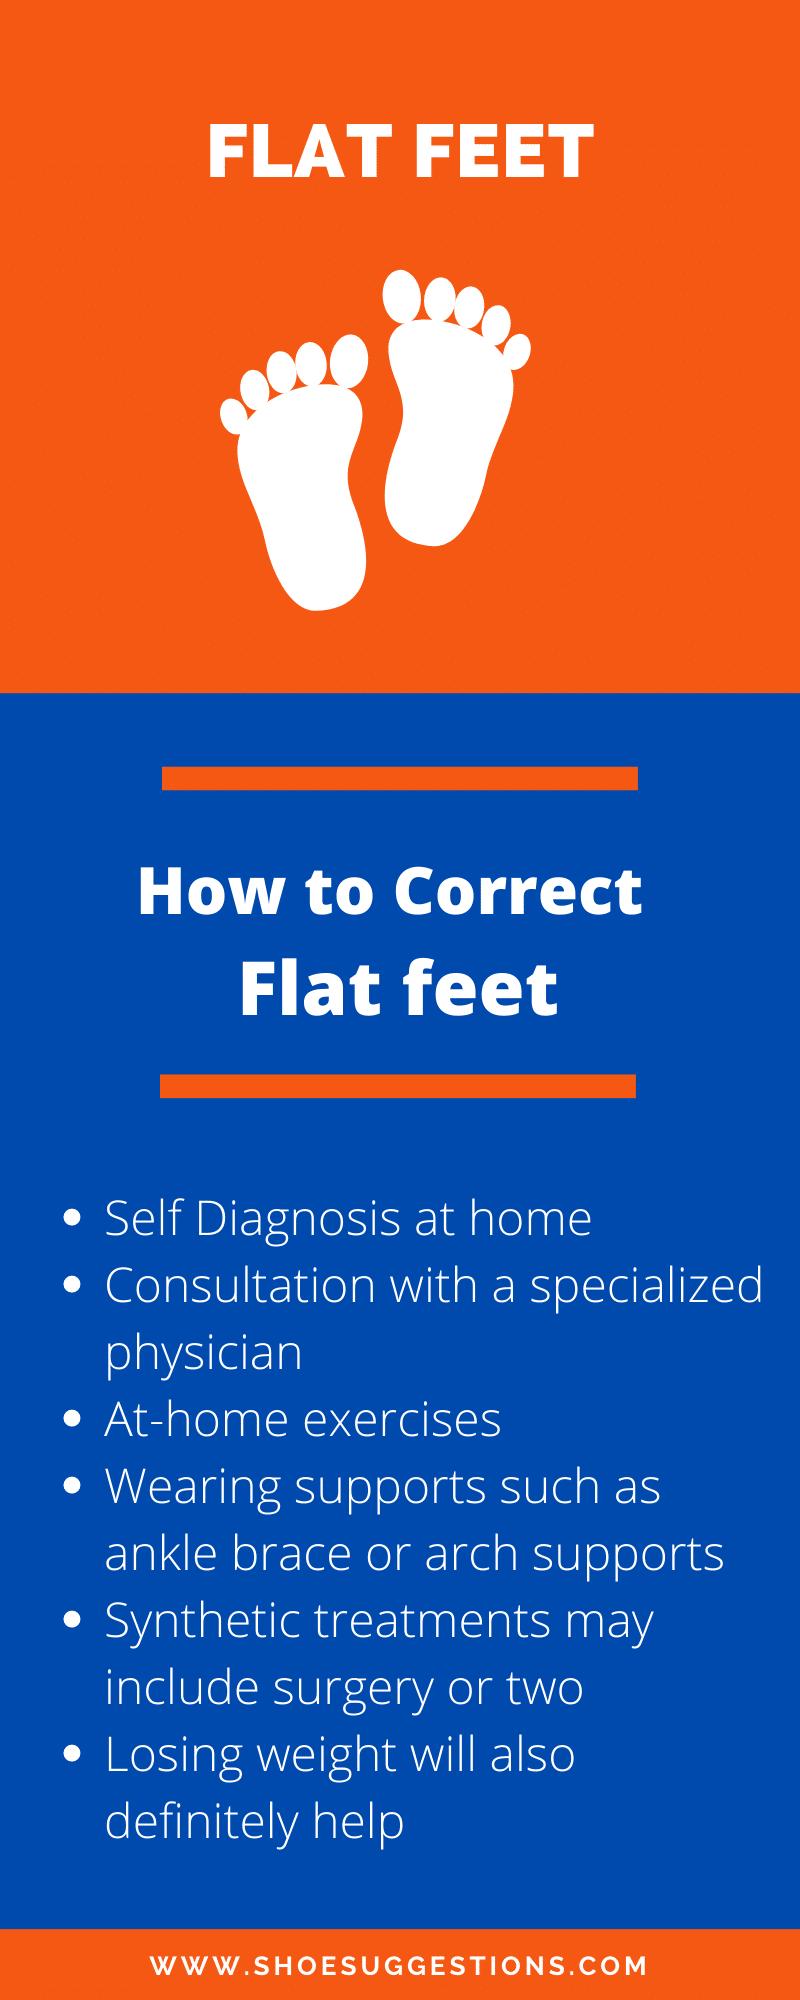 How to correct flat feet